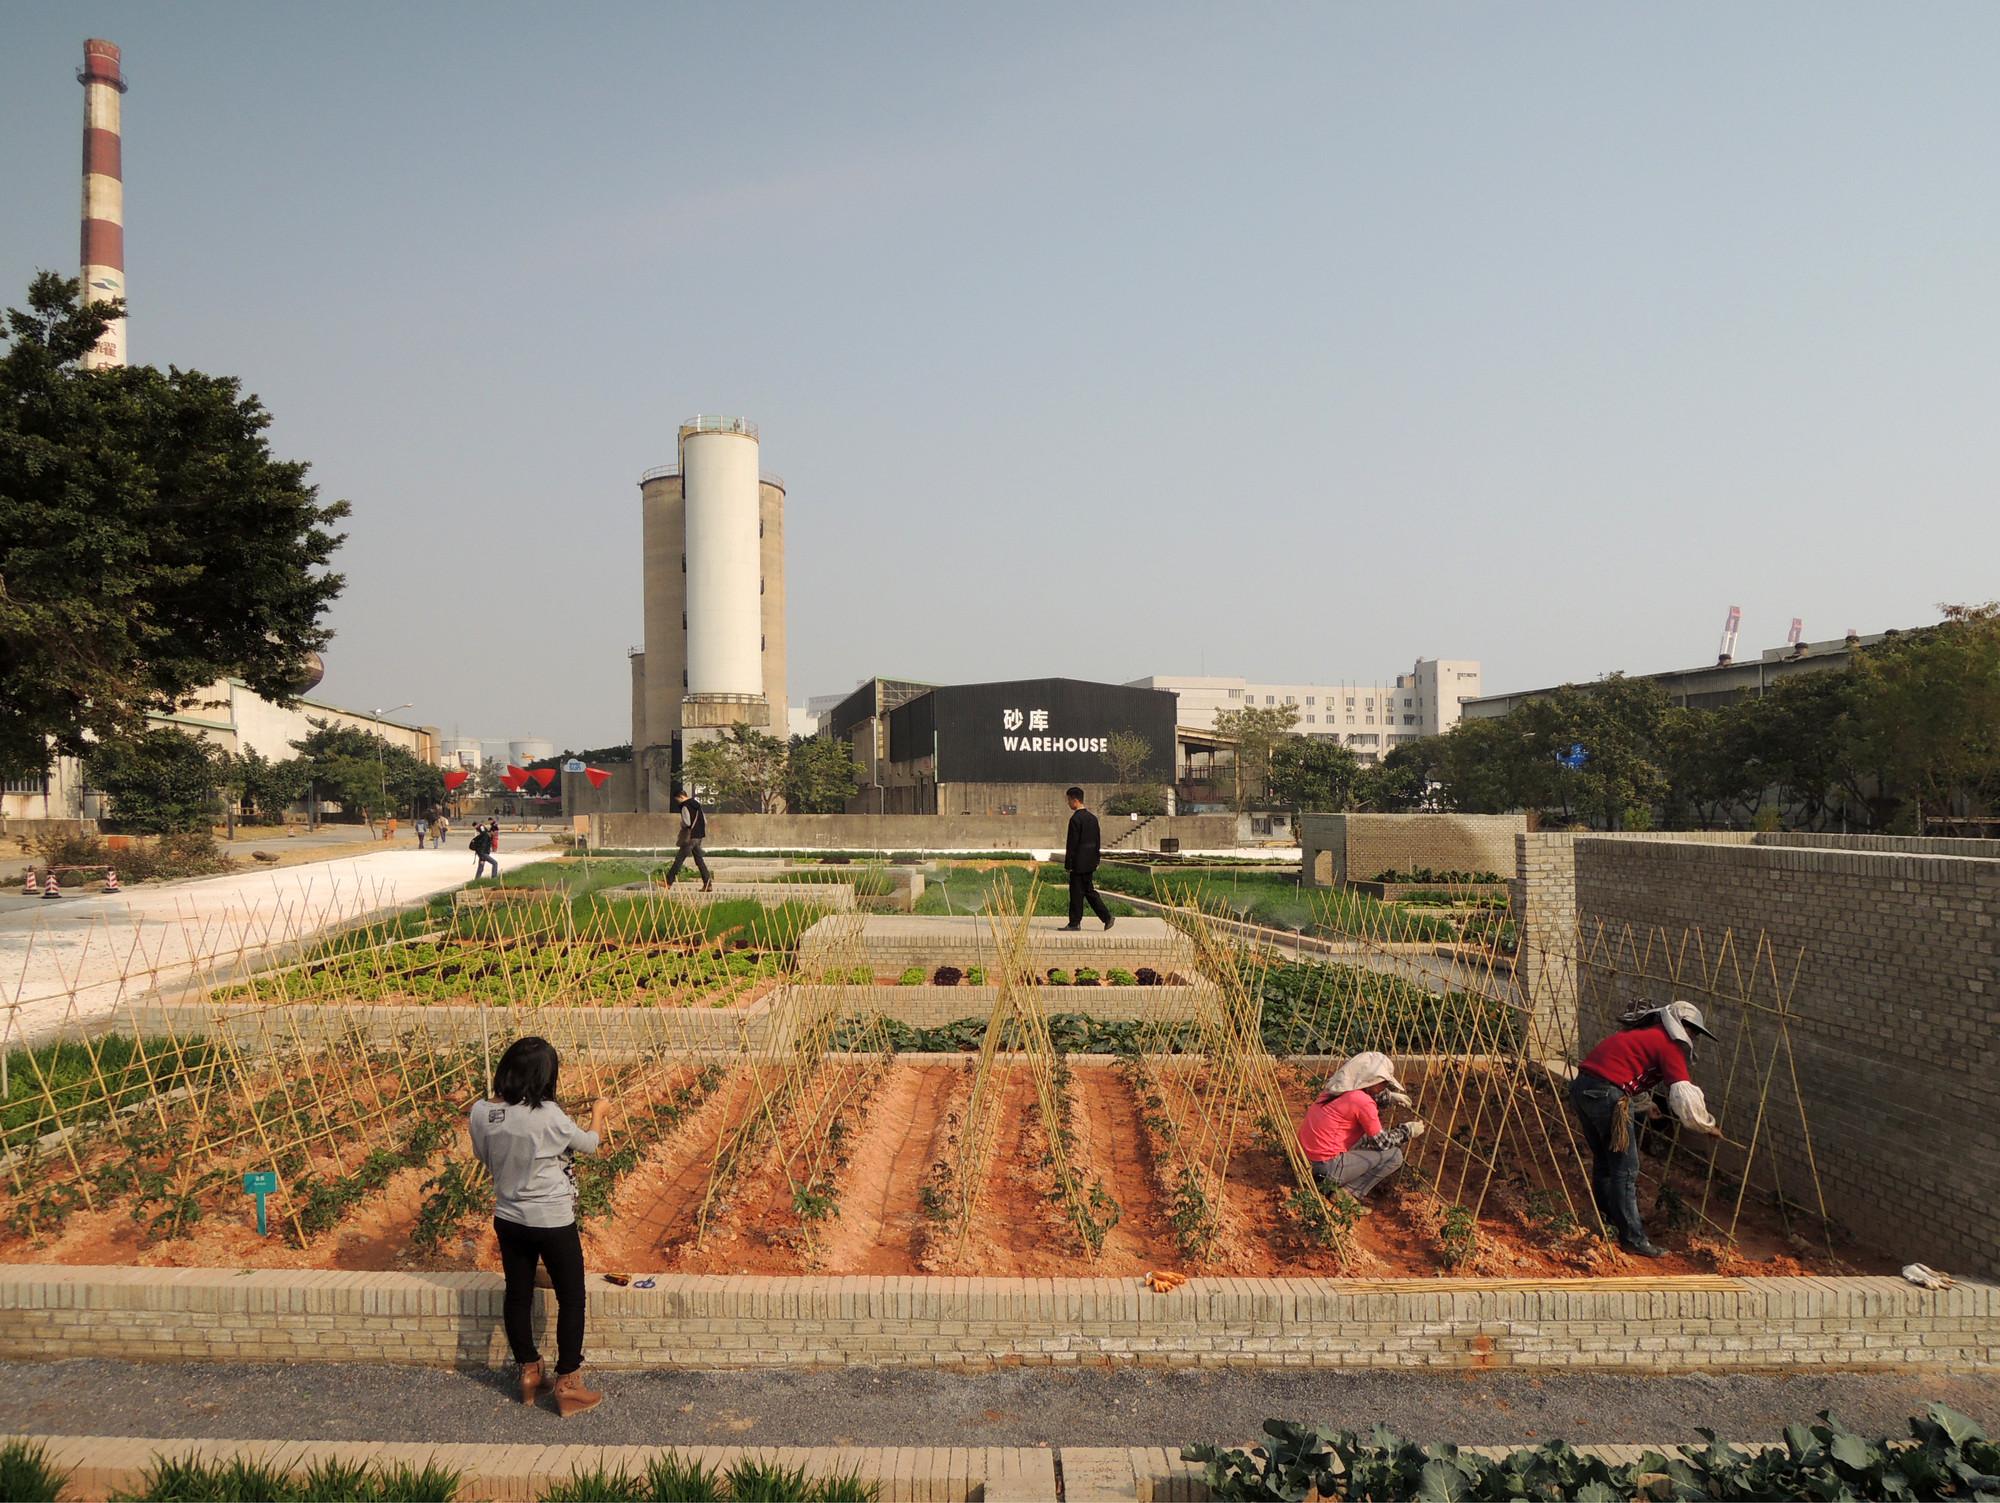 Value Farm / Thomas Chung, © Value Farm